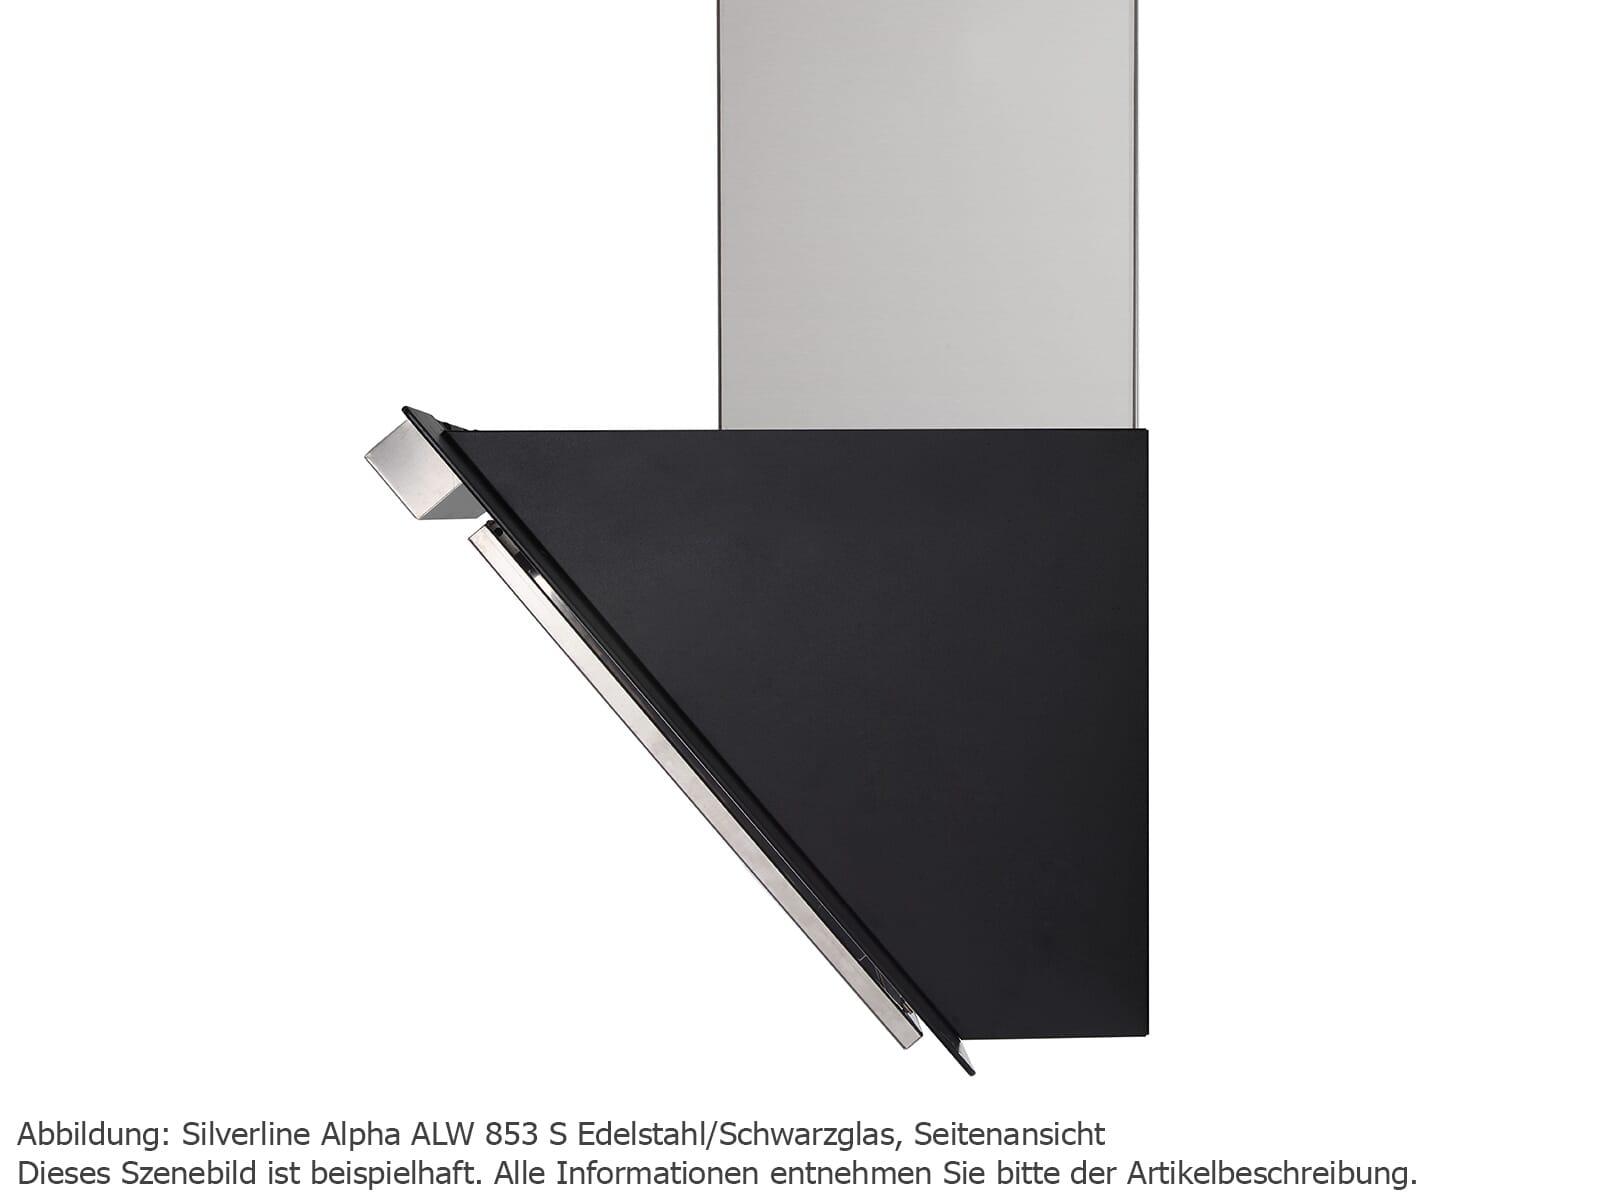 Silverline Alpha ALW 953 S Kopffreihaube Edelstahl/Schwarzglas